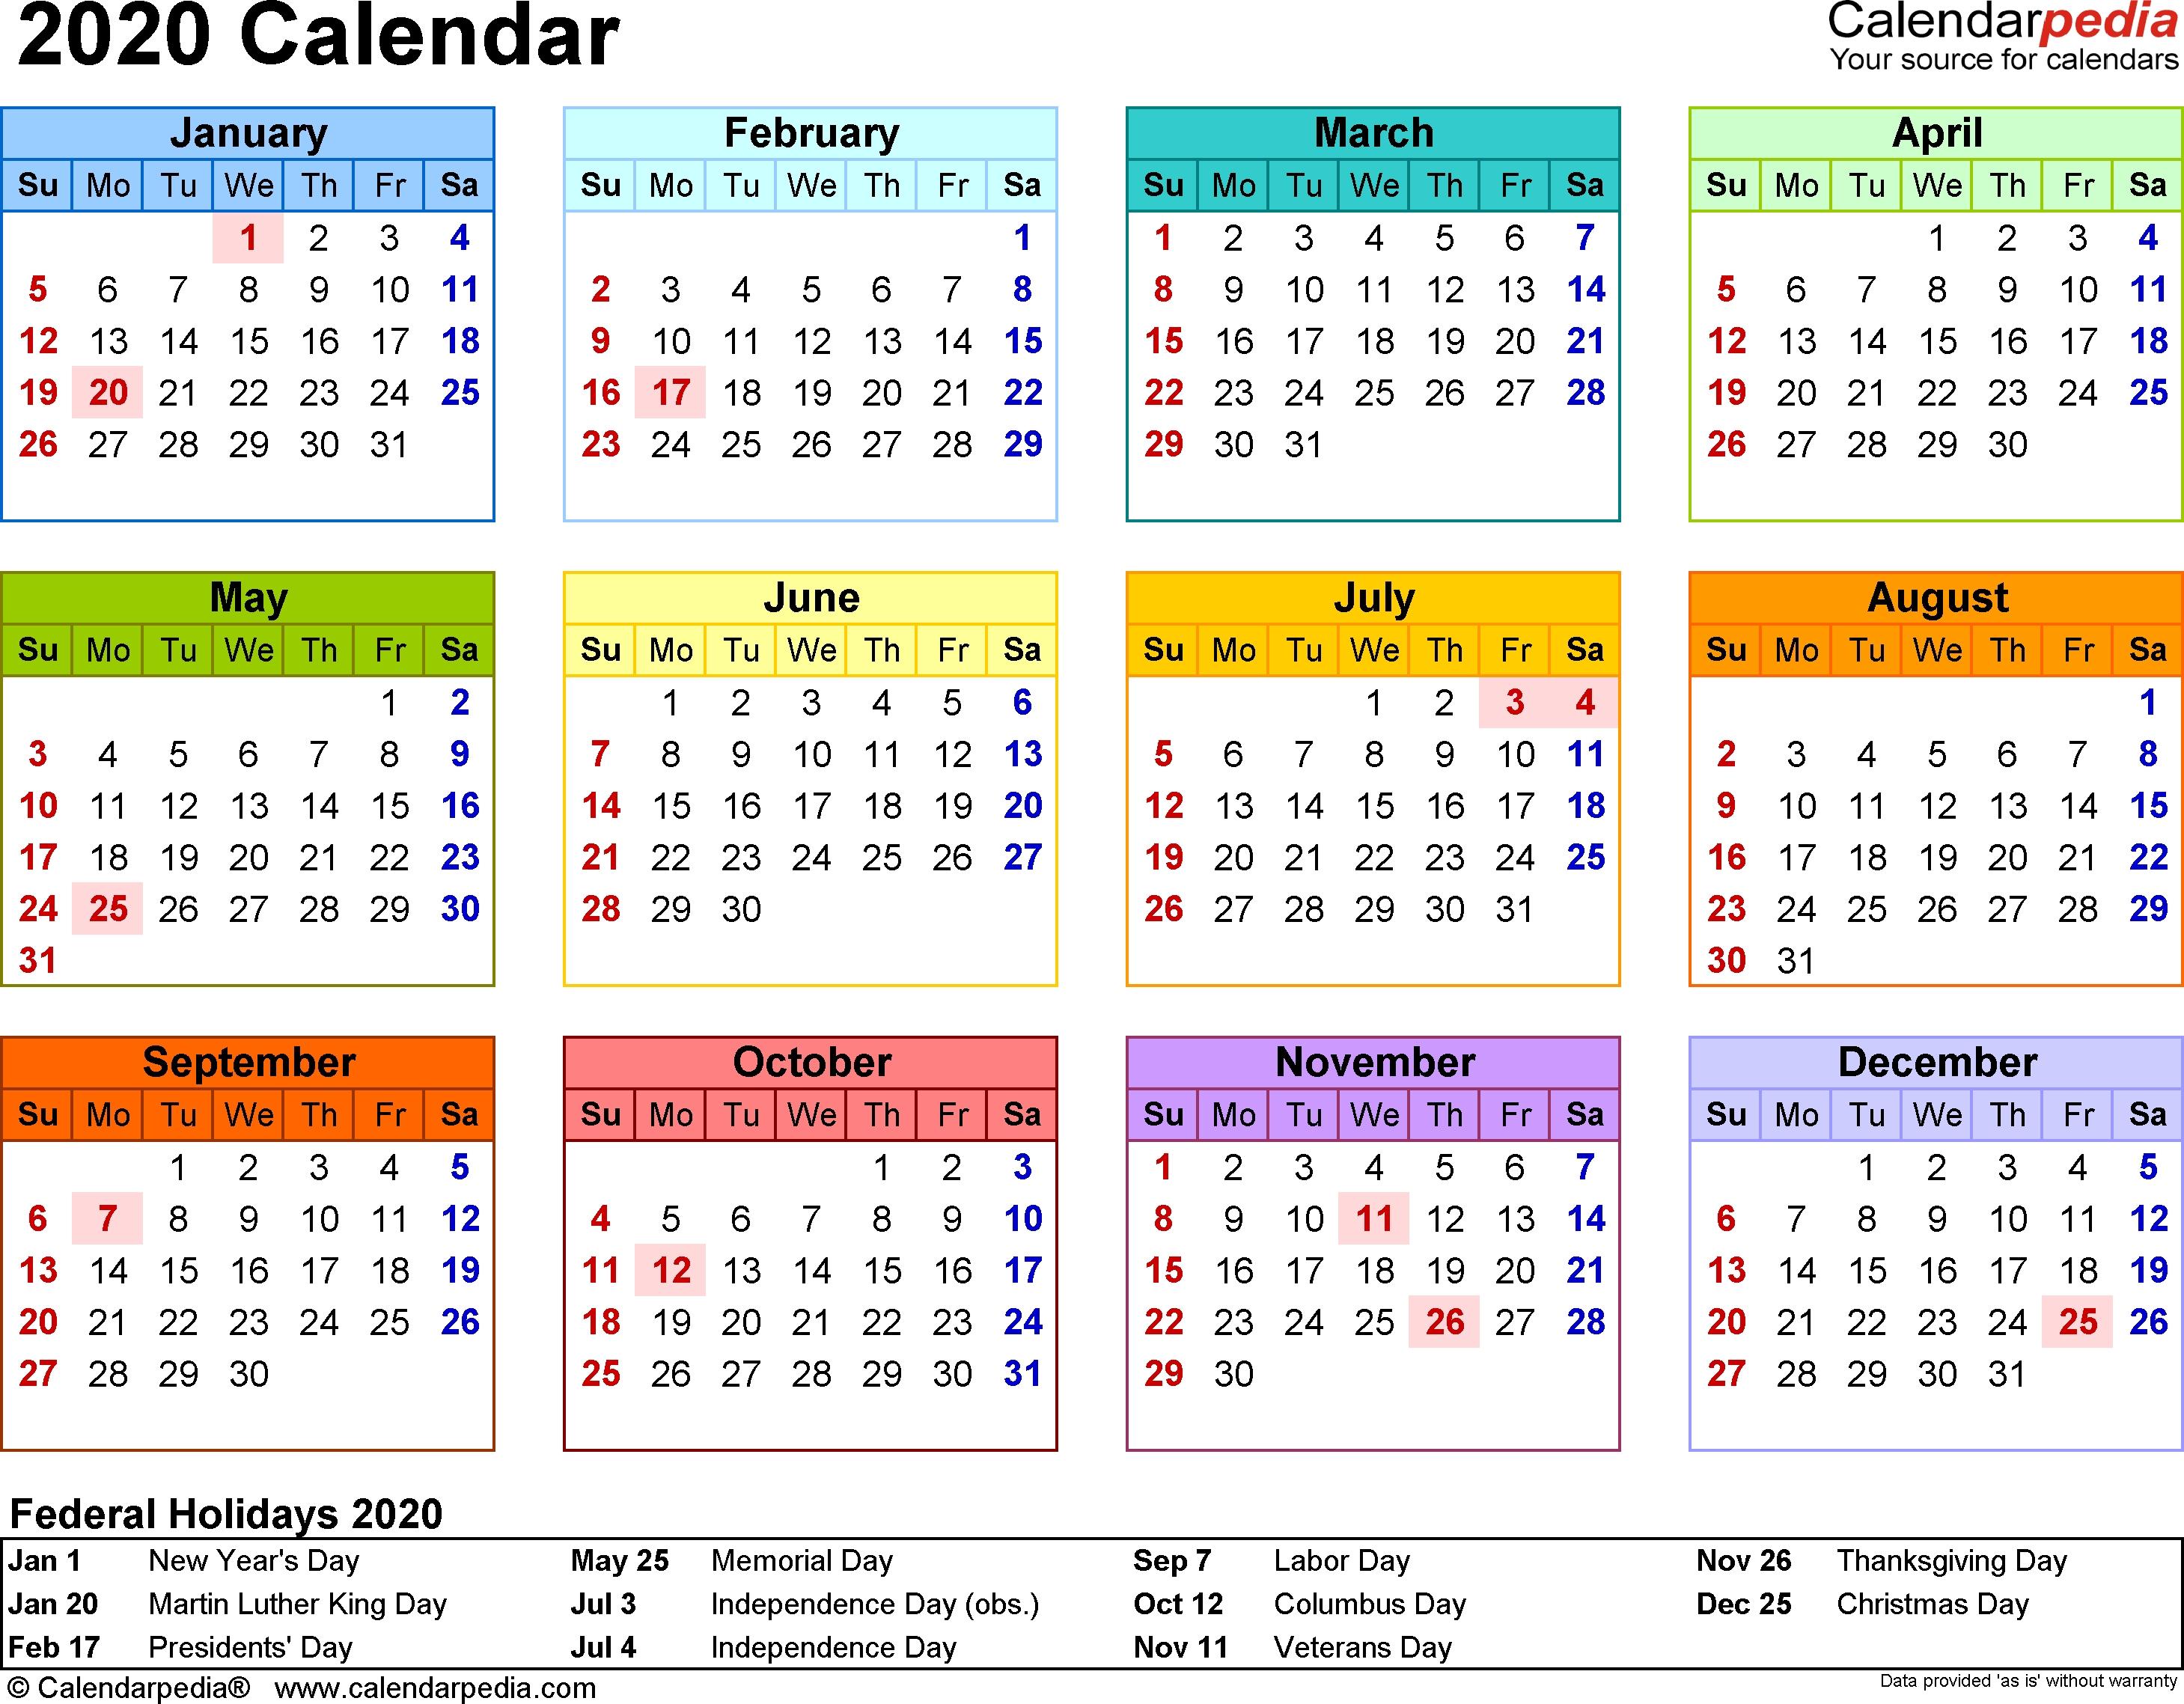 2020 Calendar - Free Printable Microsoft Word Templates Year 2020 Calender - South Africa